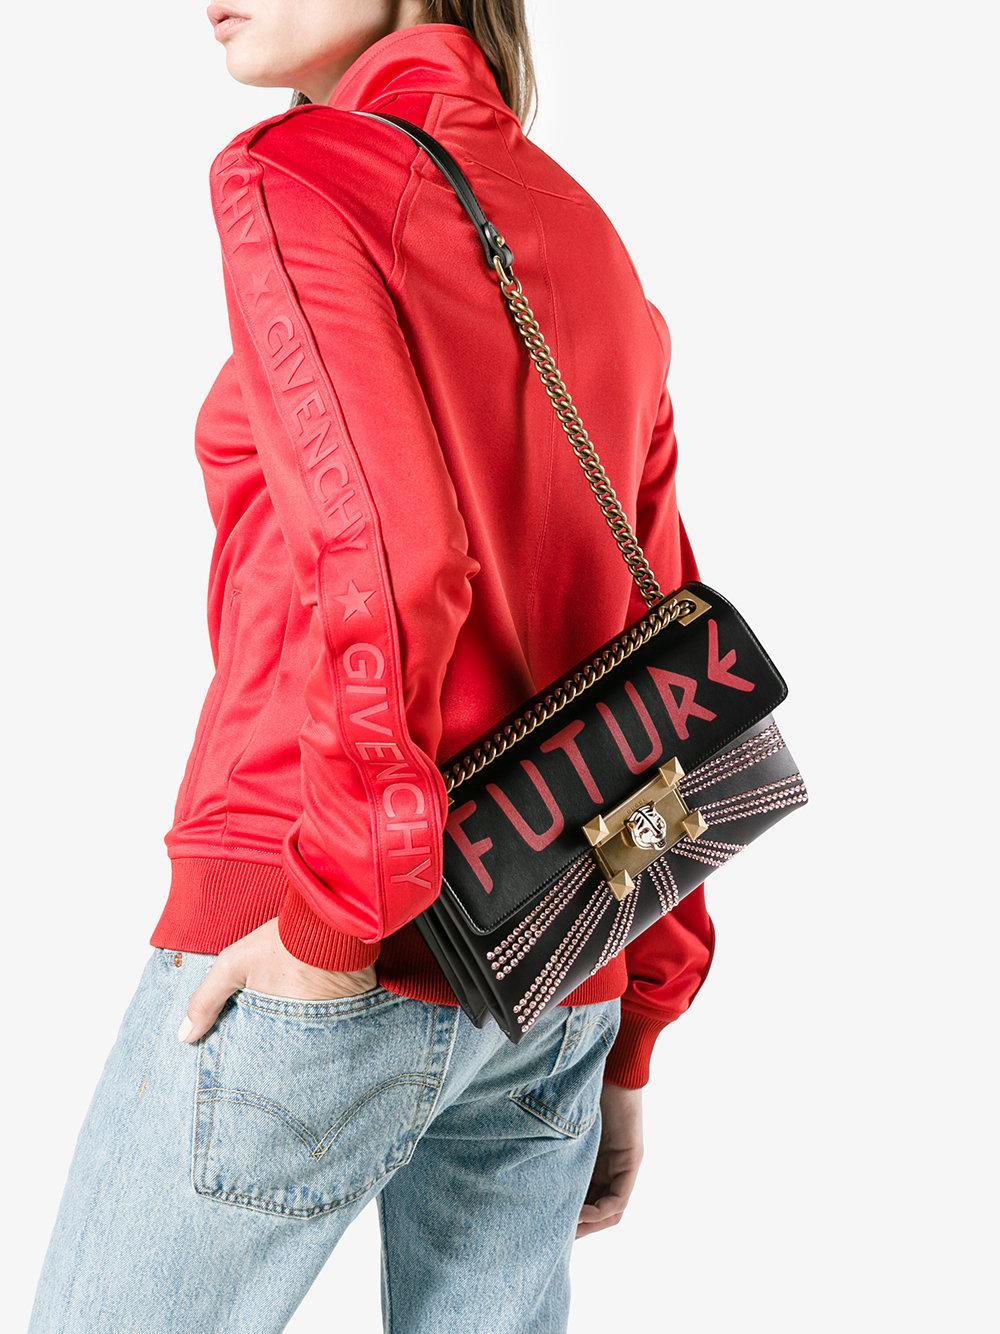 7ae27e1c717 Gucci - Black Linea Future Shoulder Bag - Lyst. View fullscreen